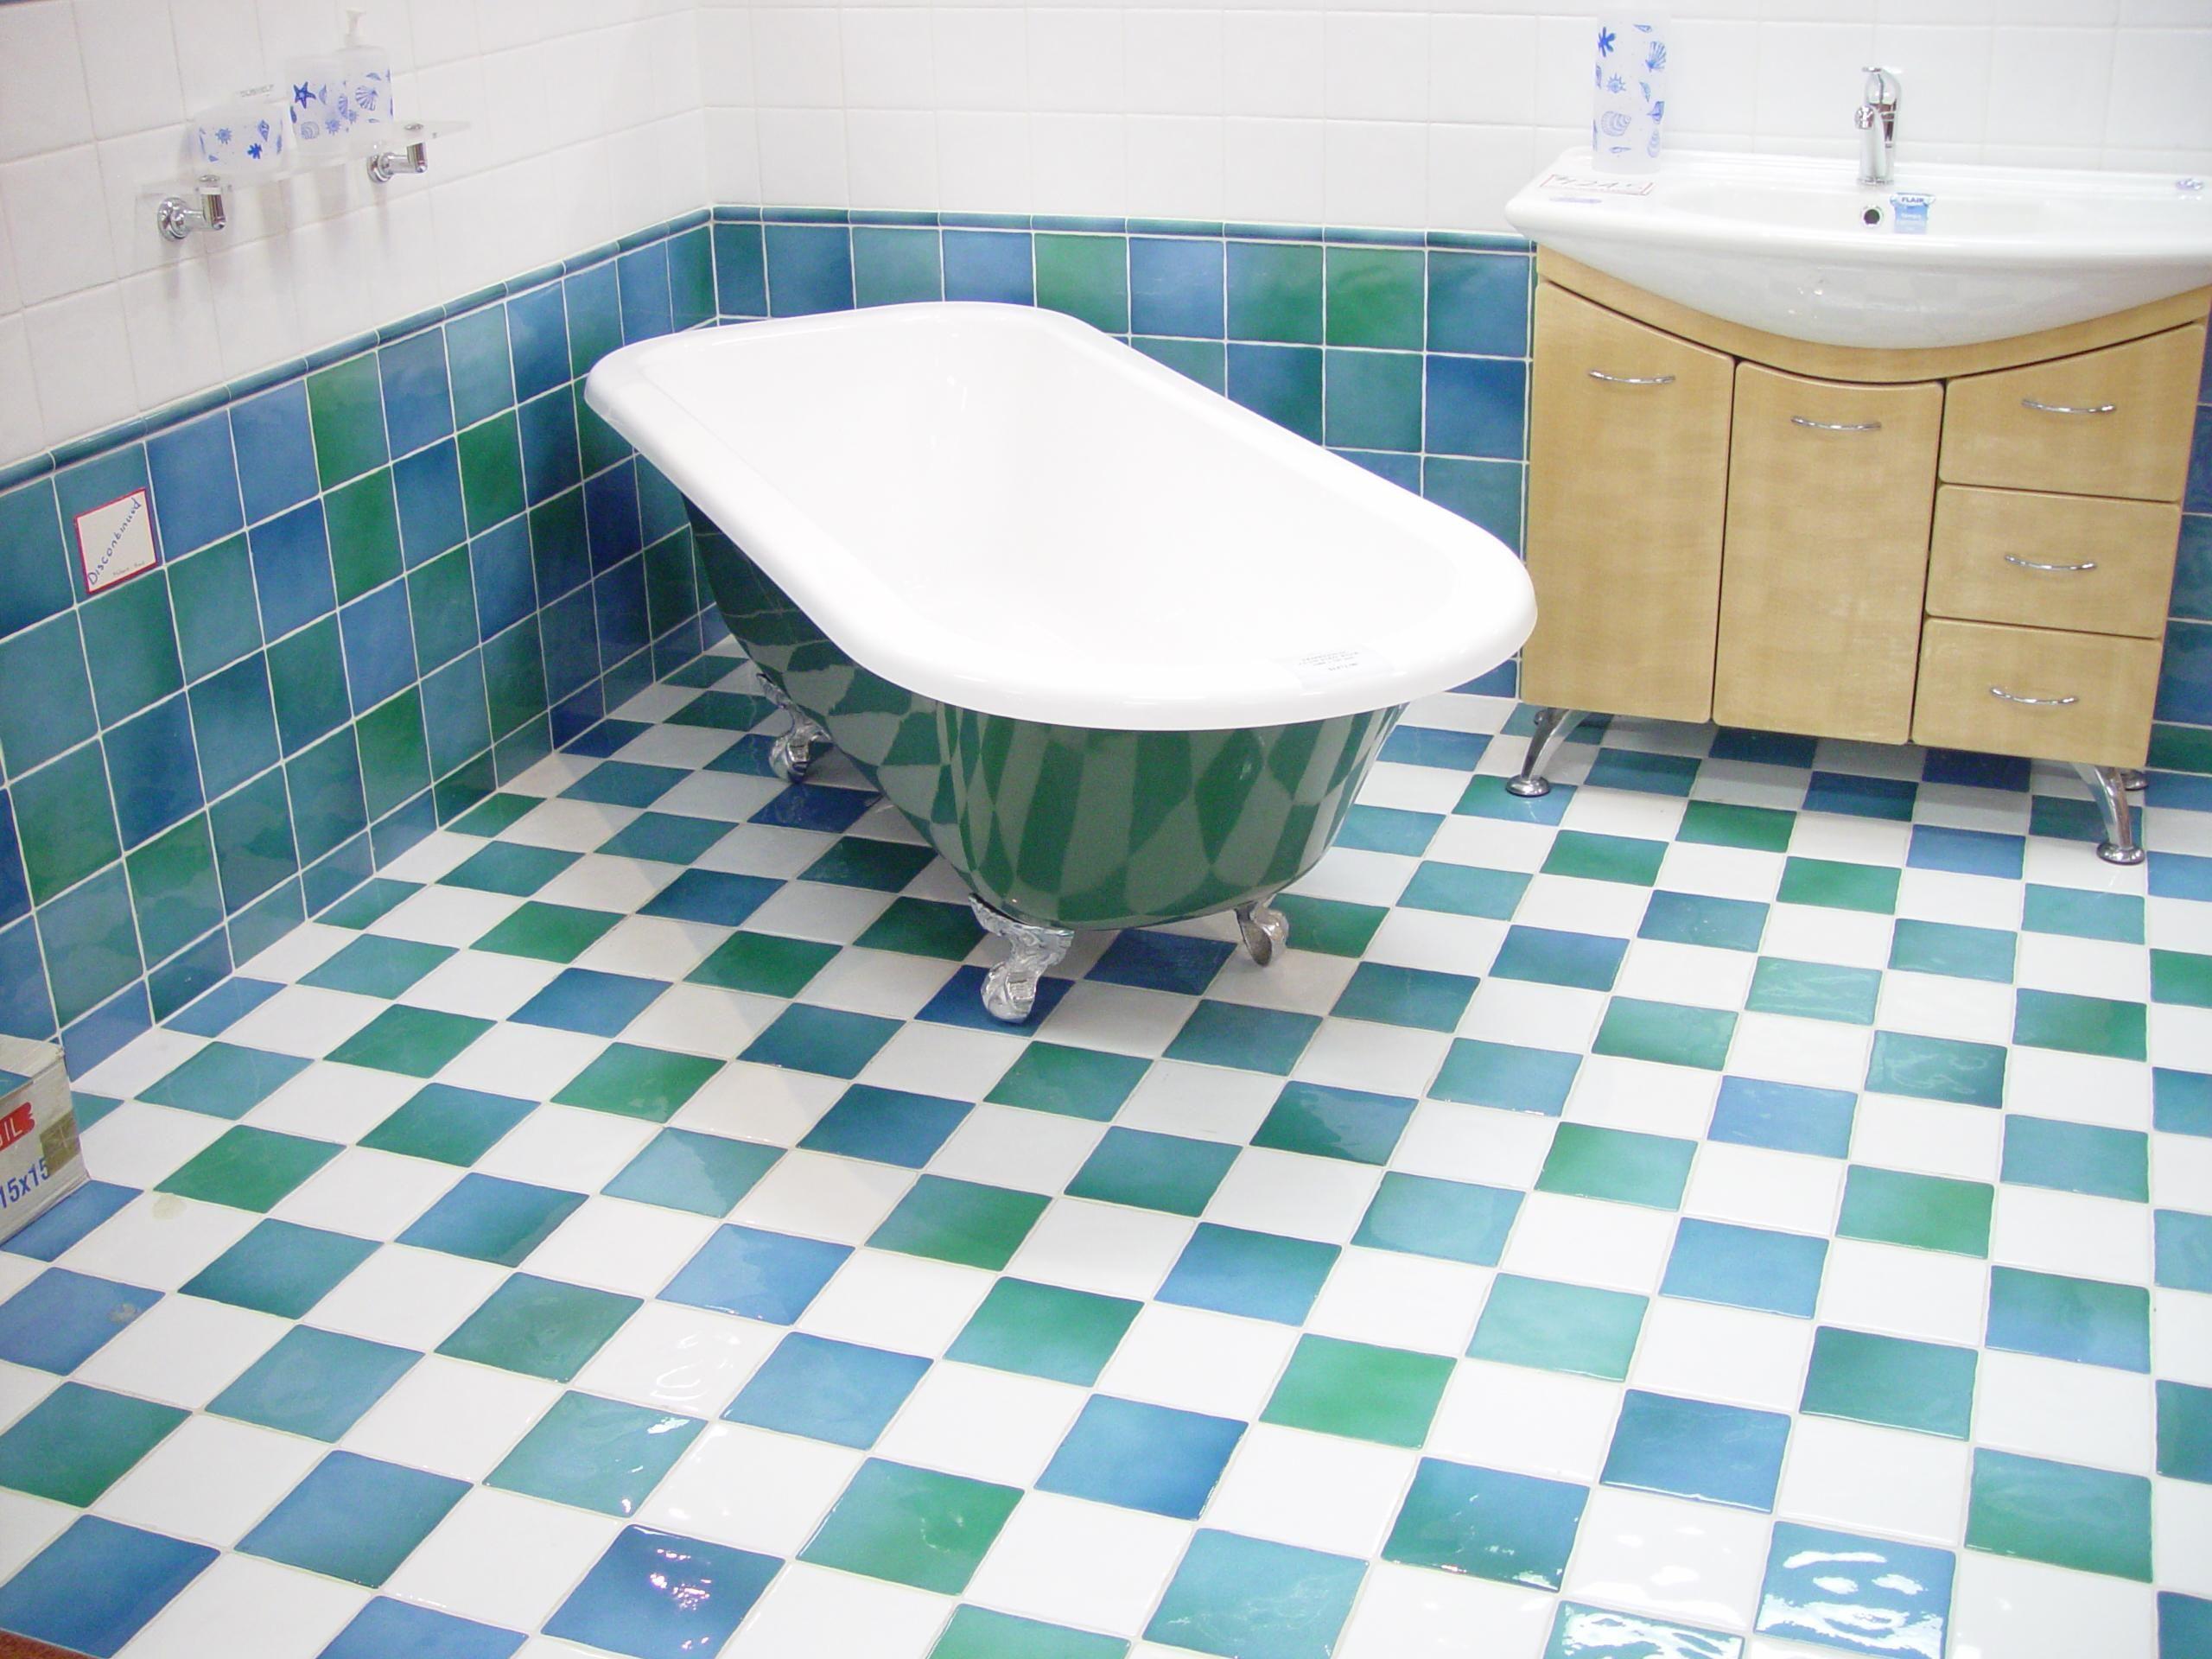 Vasca Da Bagno White : Persone donna vasca da bagno · foto gratis su pixabay